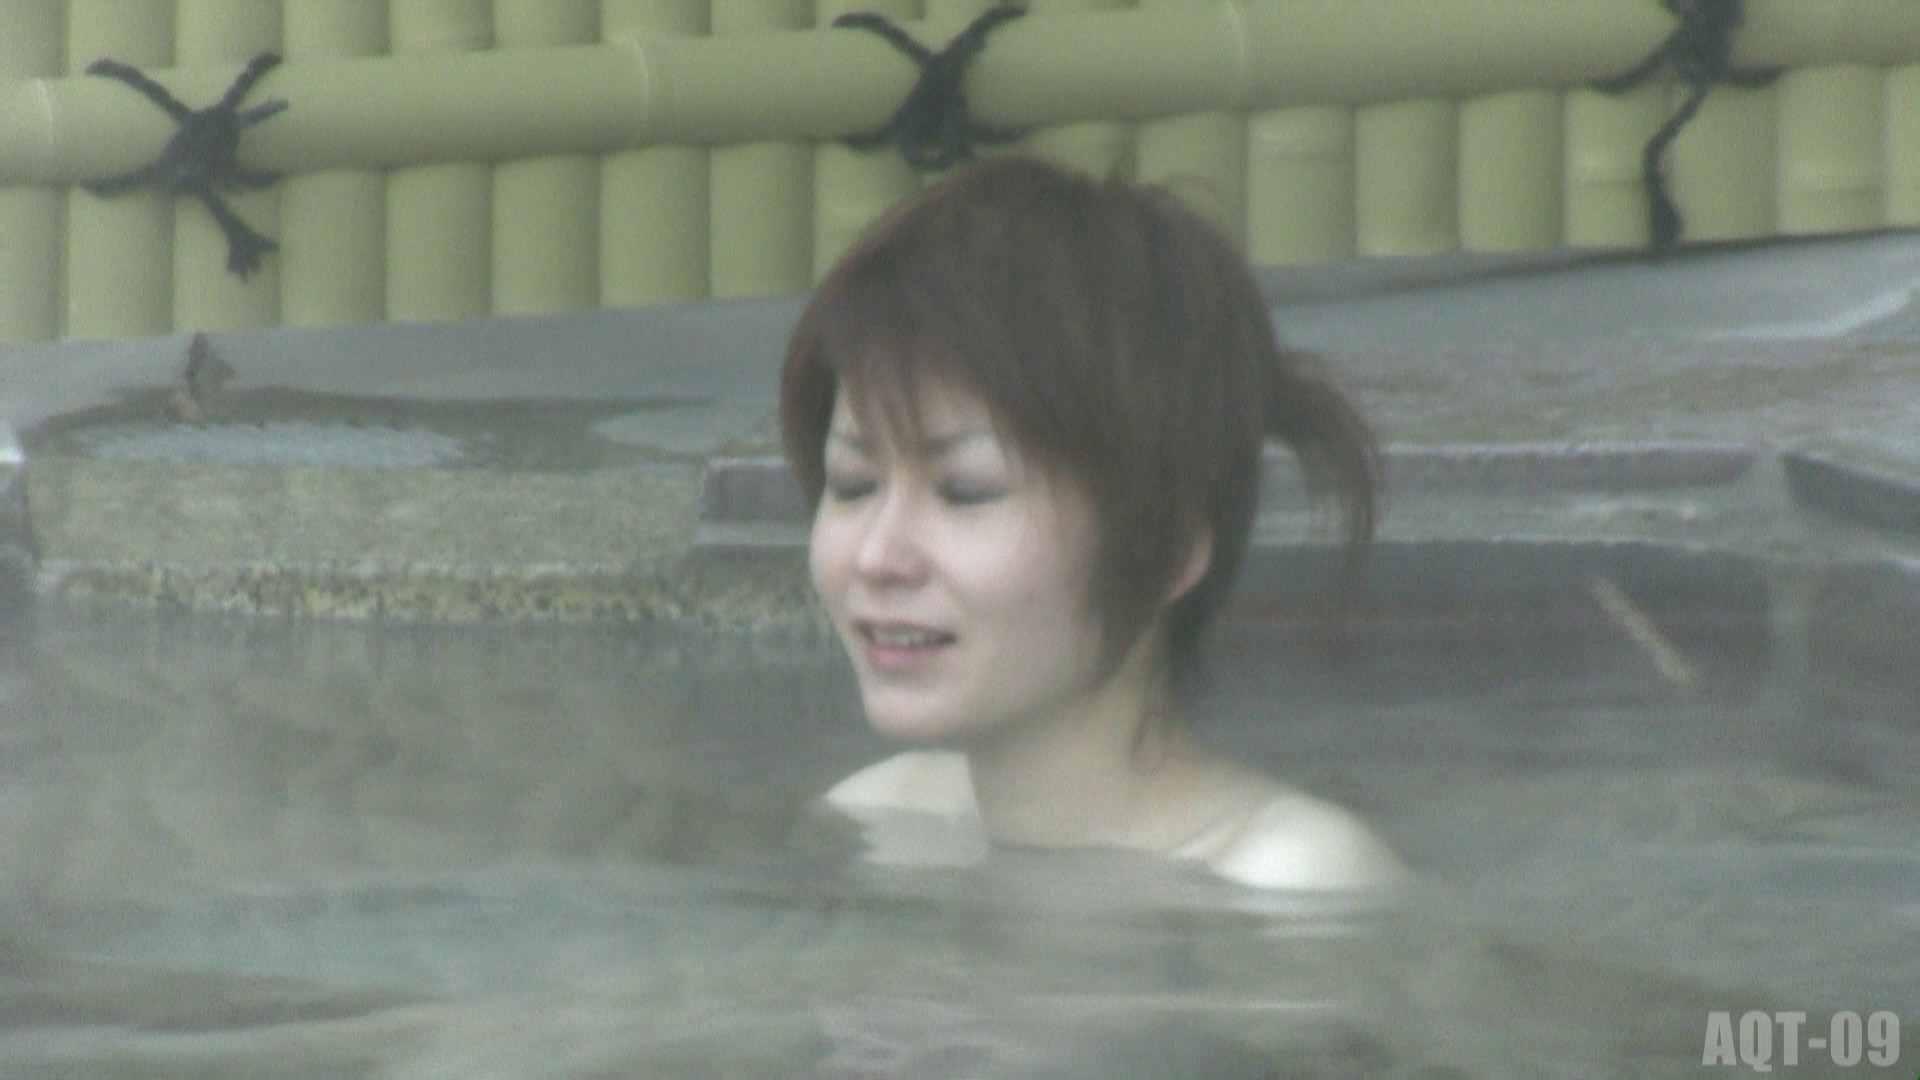 Aquaな露天風呂Vol.779 OLセックス 覗きおまんこ画像 107画像 2